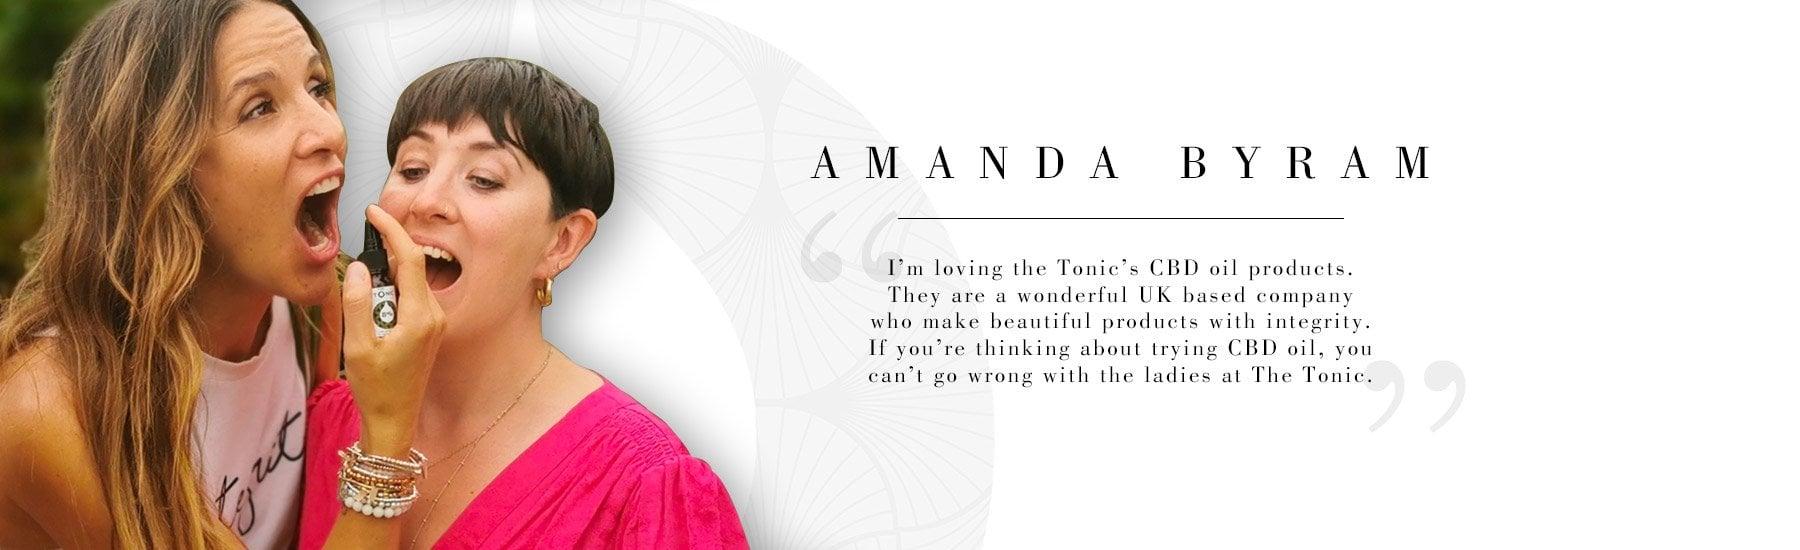 The Tonic Tribe - Amanda Byram